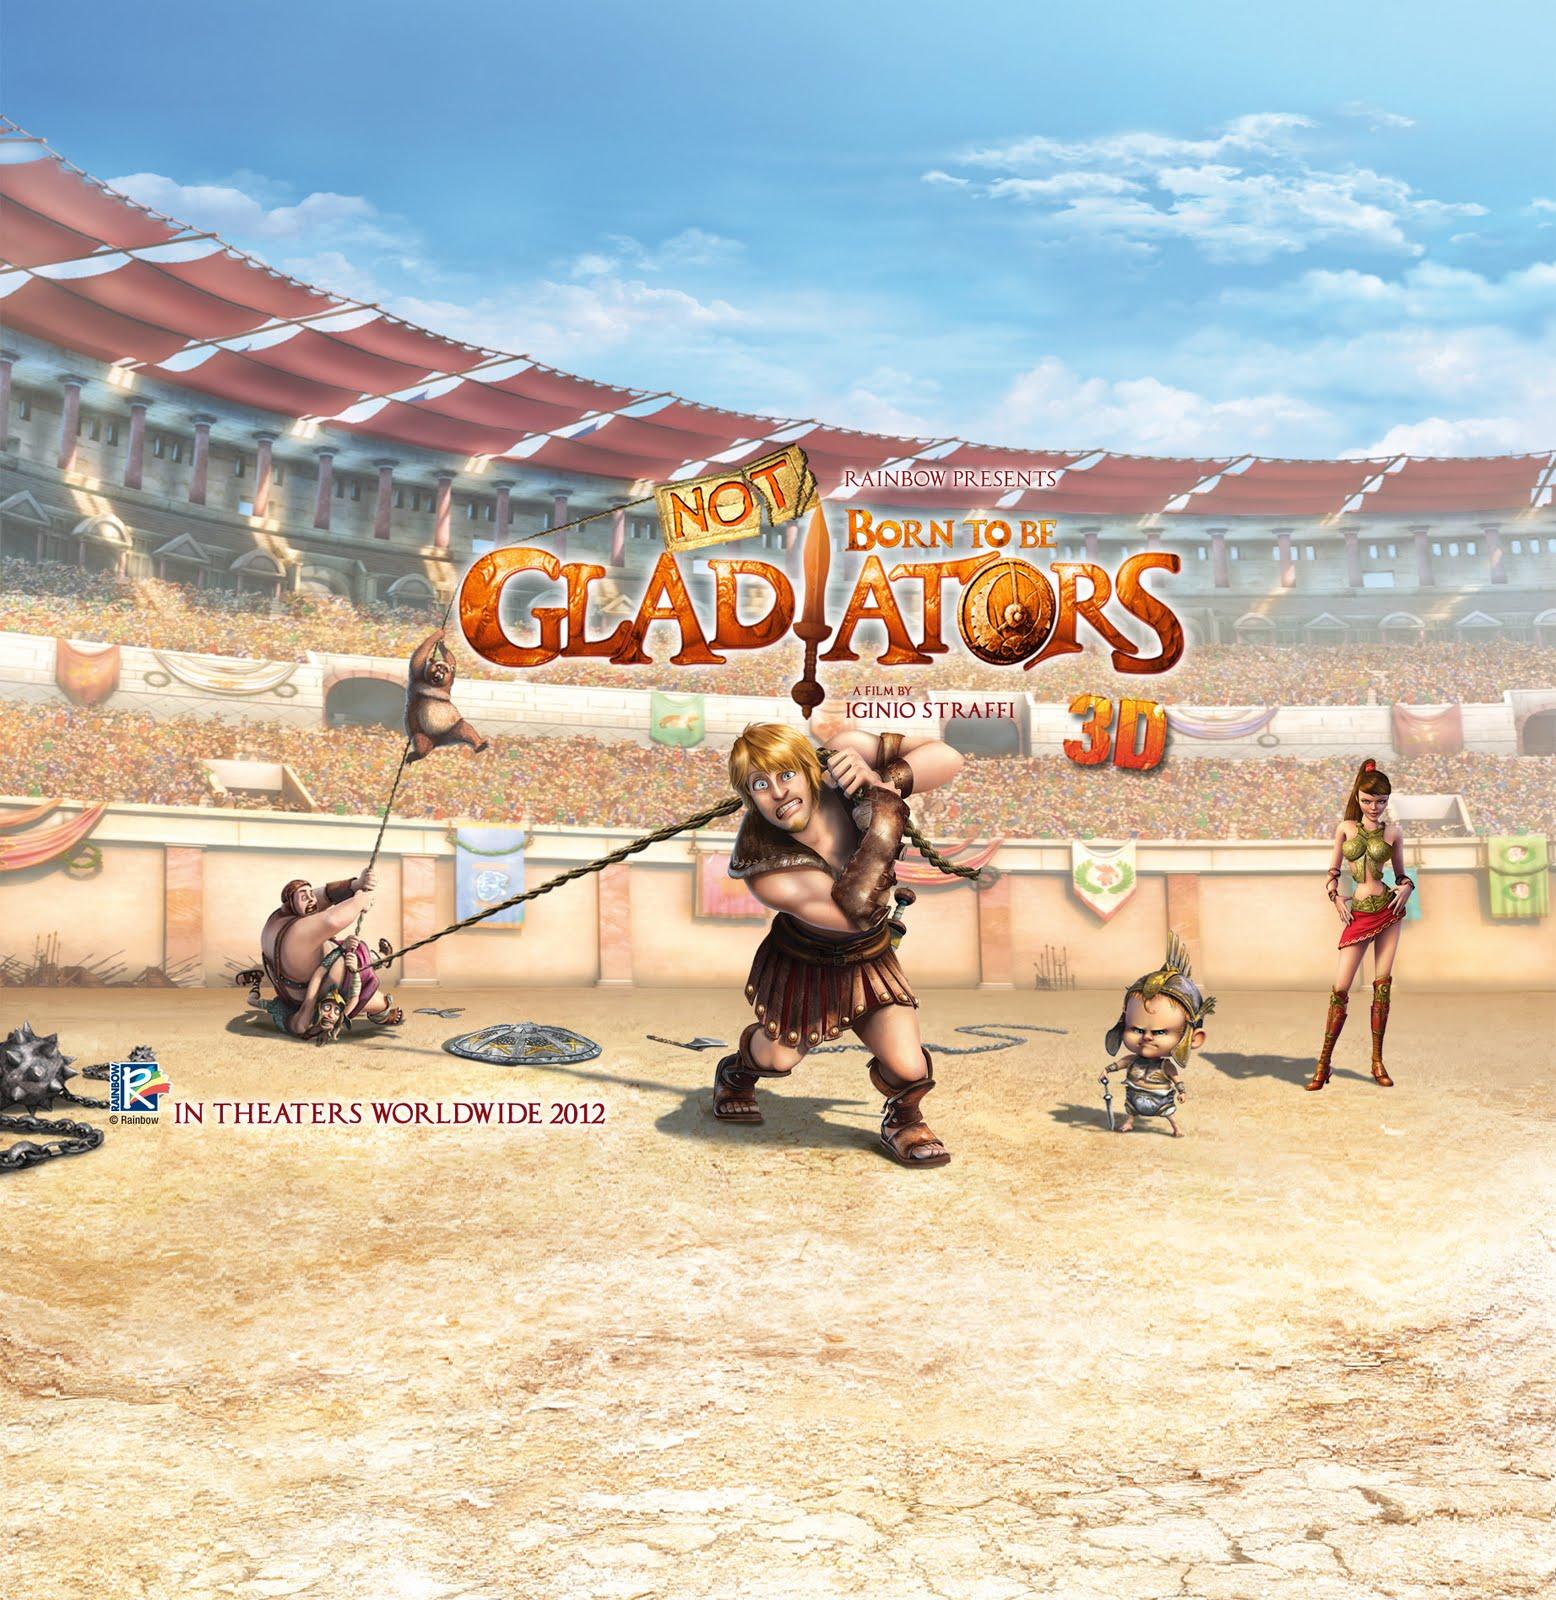 [Animation 2012] Born to be Gladiators [HGBit.com][Sub Eng Vie]